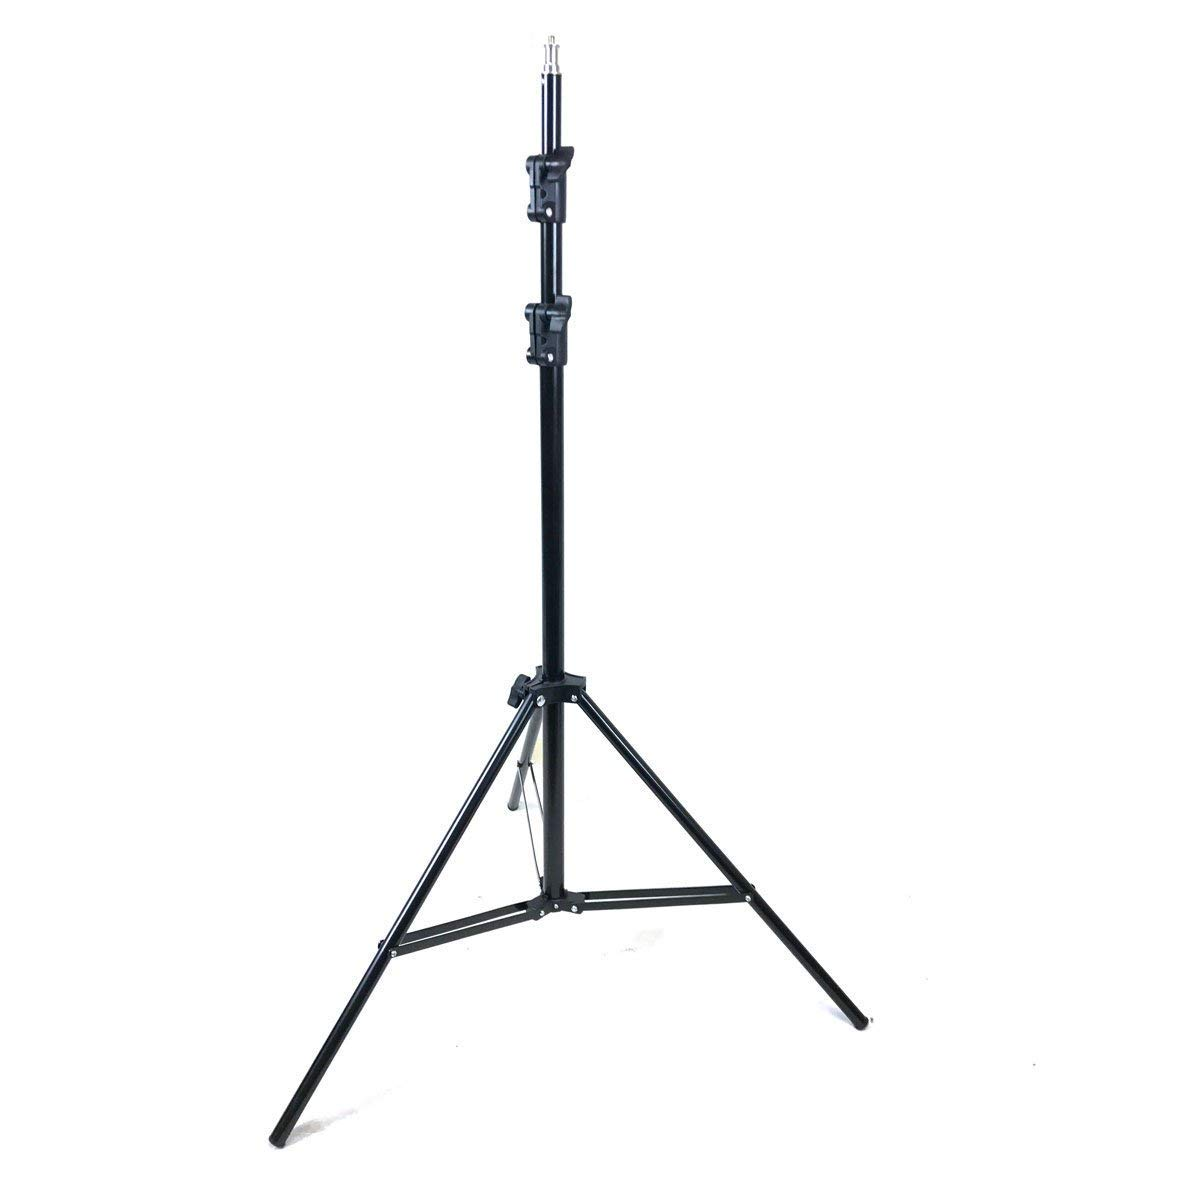 StudioFX 400W Set of (2) 84'' Photo Light Stand Snow-White Umbrella Light/Includes 45W 5500K Bulb CHDK2